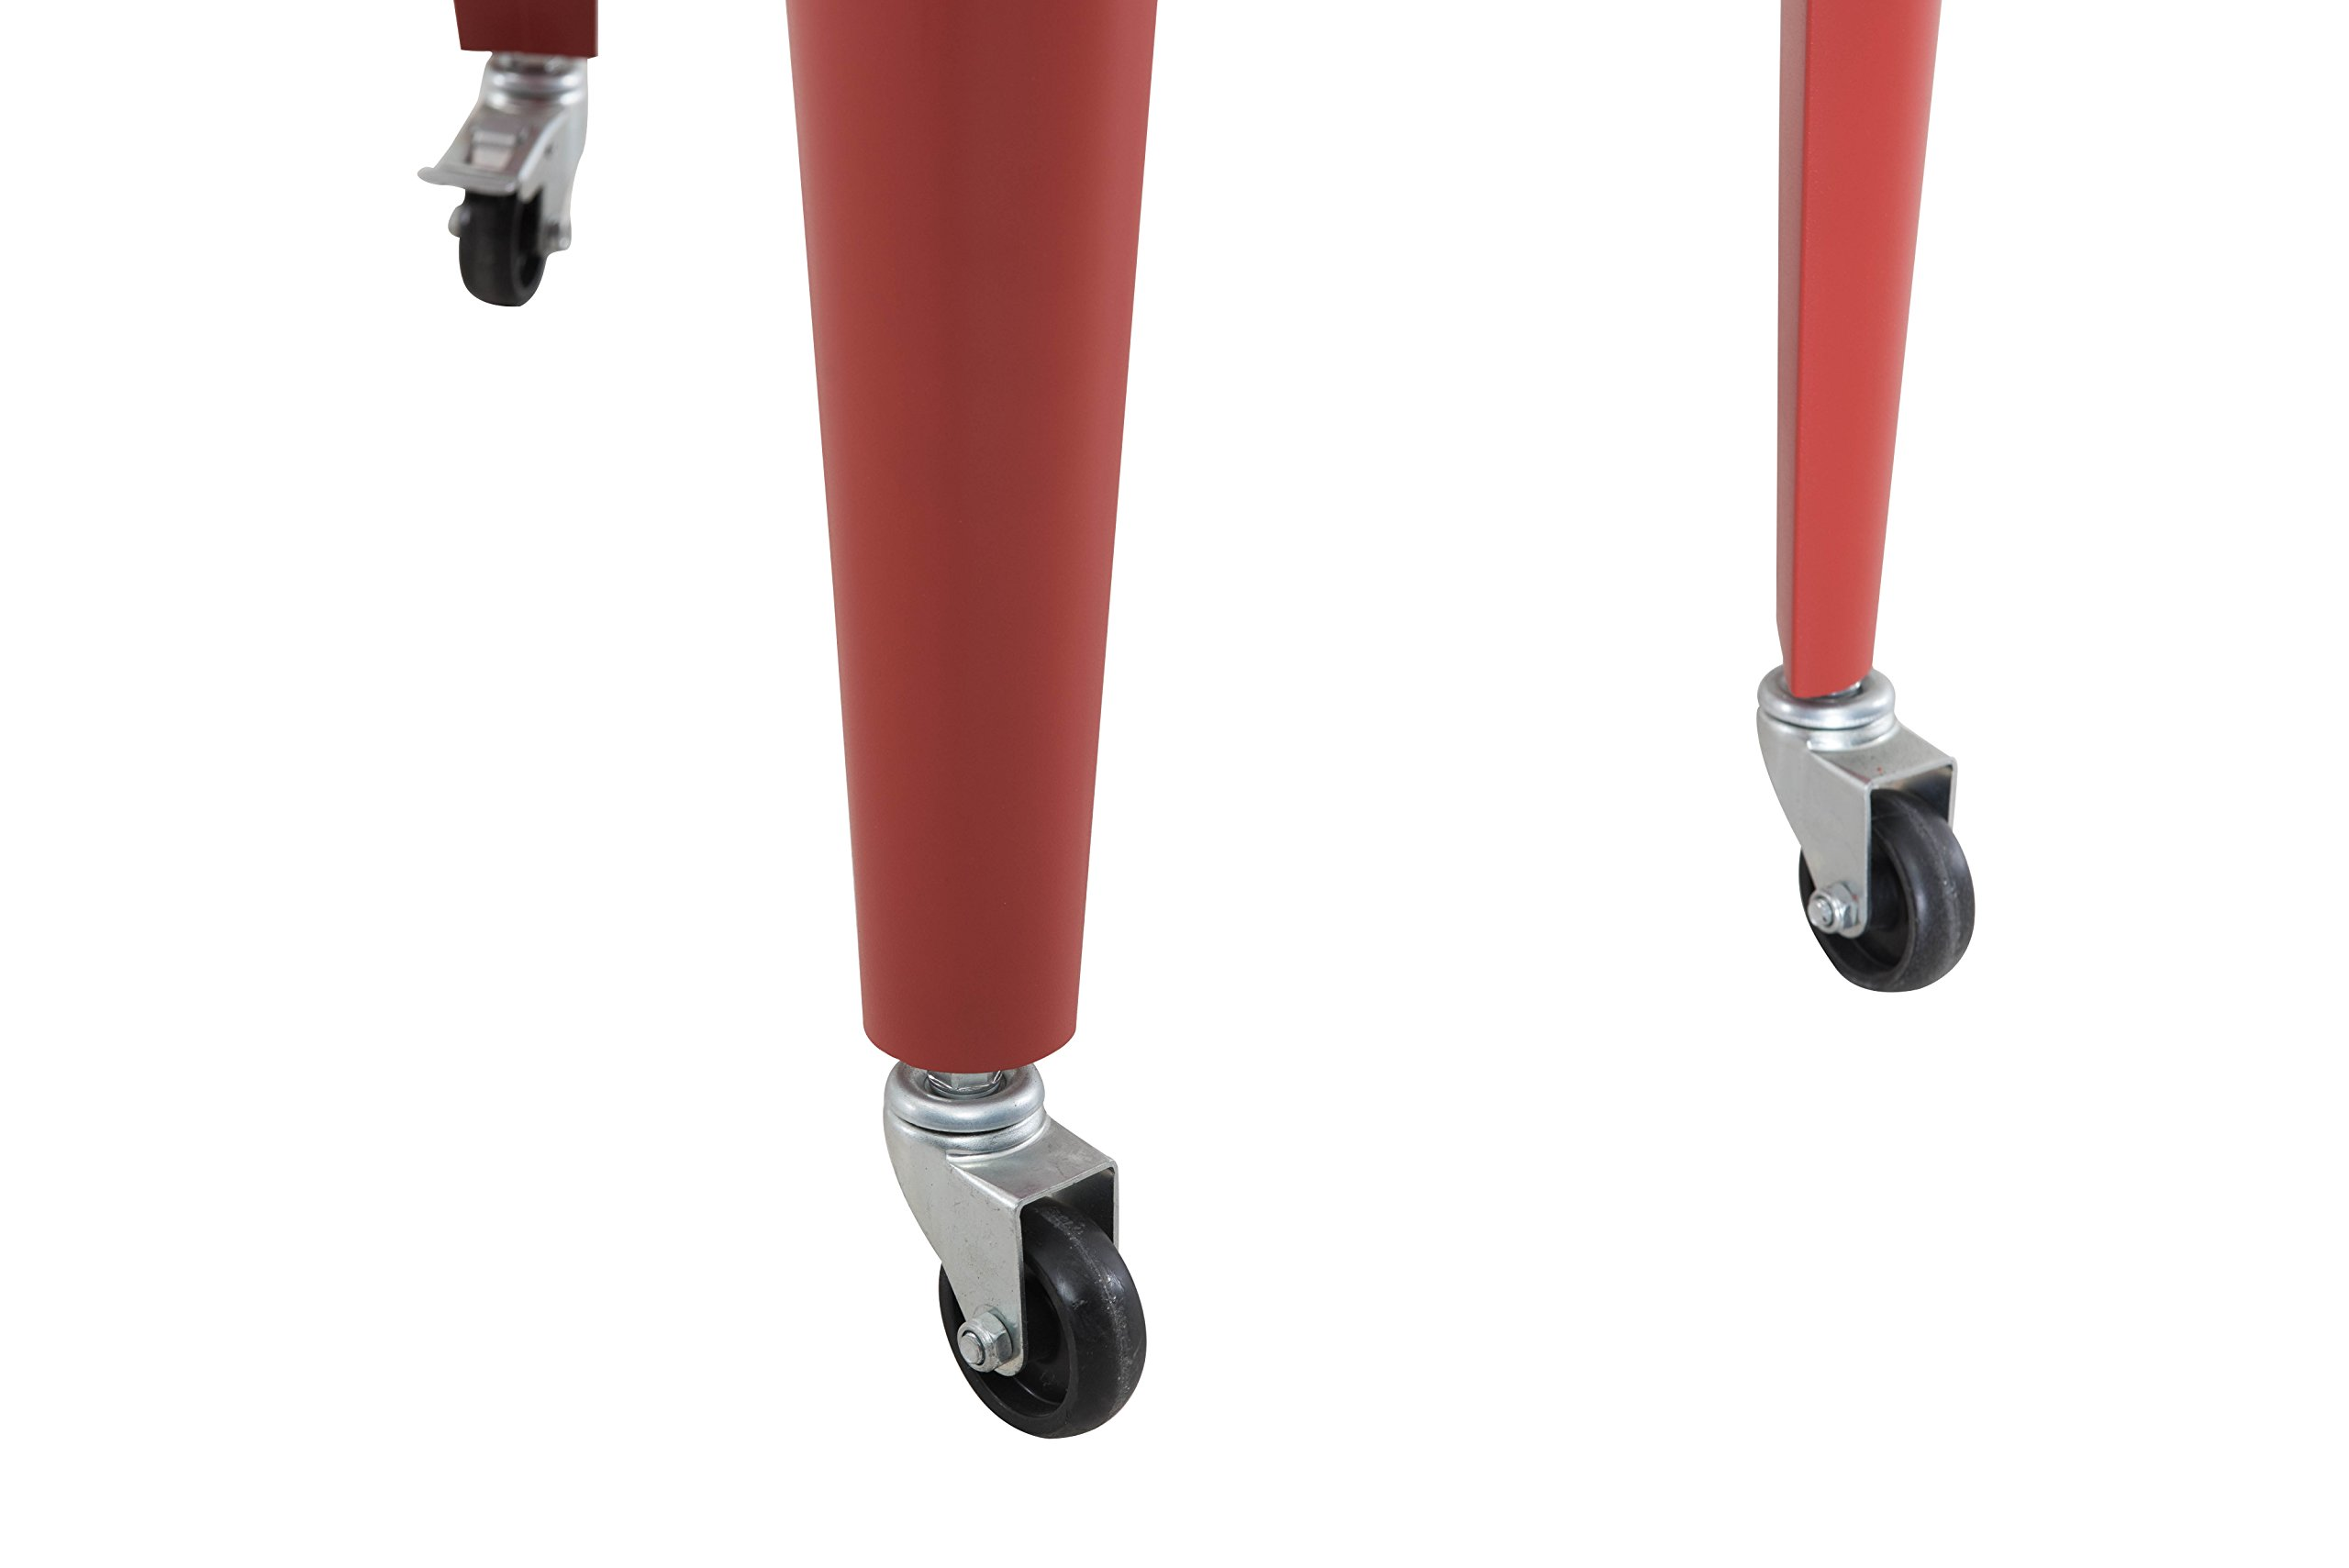 Sunjoy L-BC153PST 60 quart Wheeled Beverage Cooler in Red by sunjoy (Image #13)